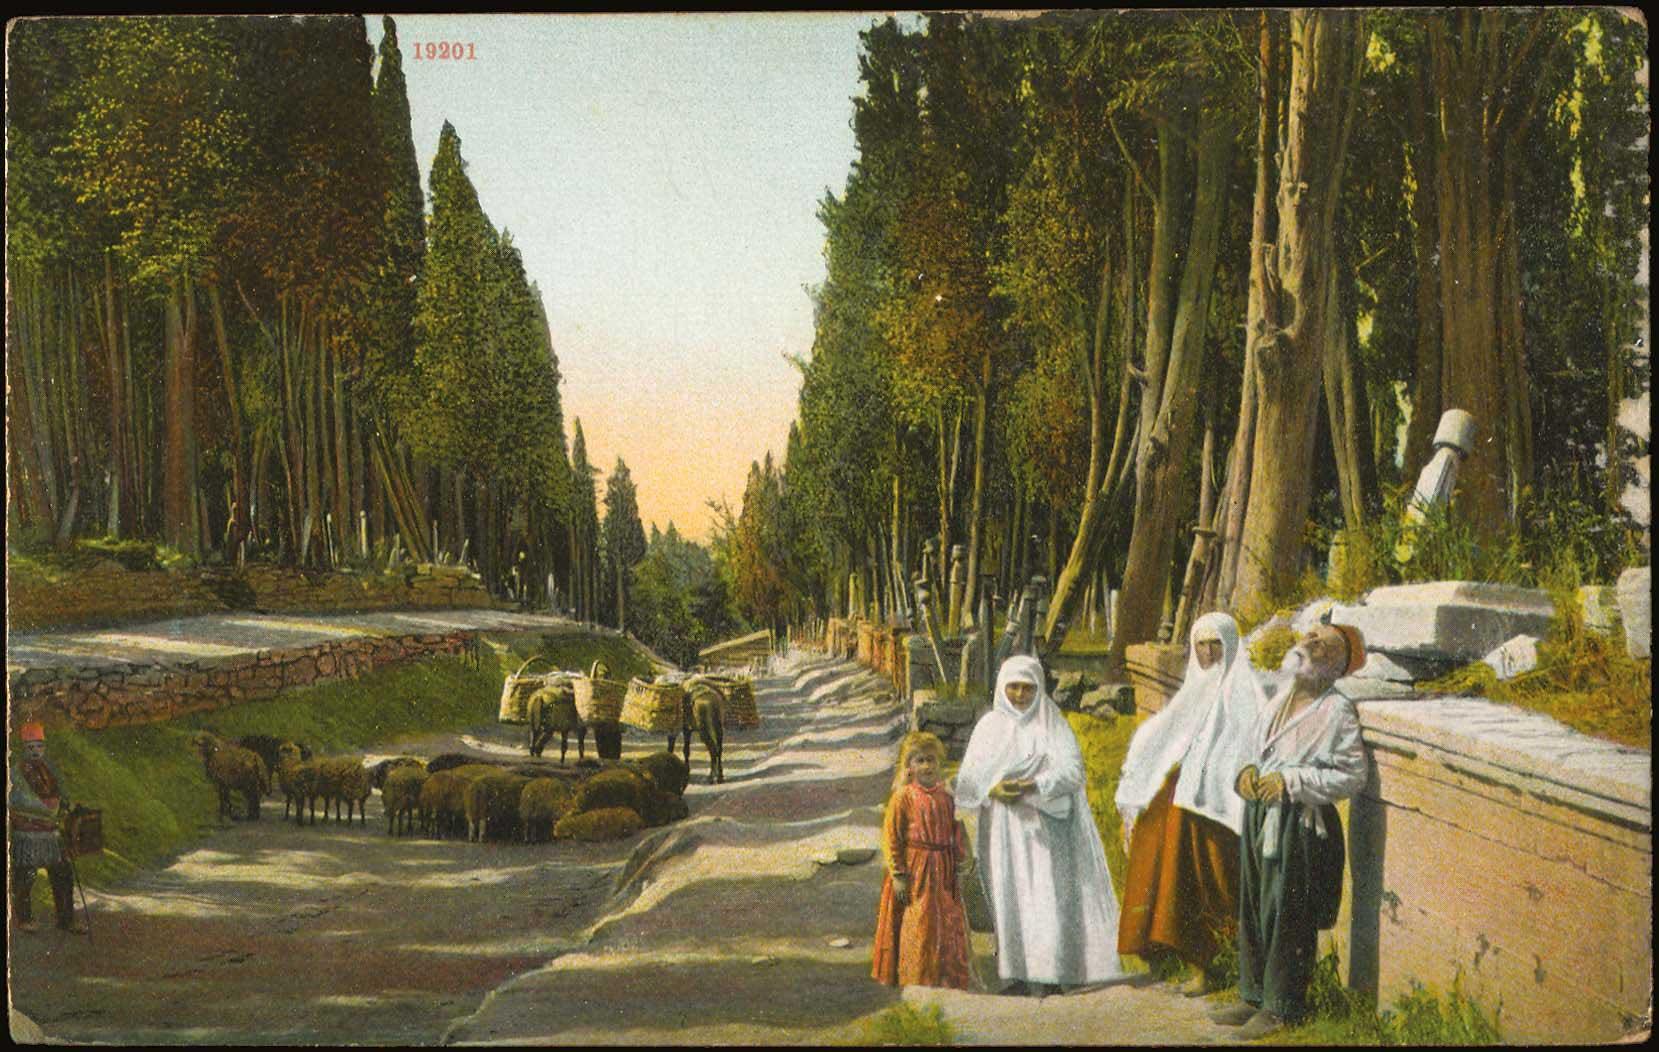 Lot 1760 - -  PICTURE POSTCARDS SMYRNE, CONSTANTINOPLE, ASIA MINOR -  A. Karamitsos Public & Live Internet Auction 675